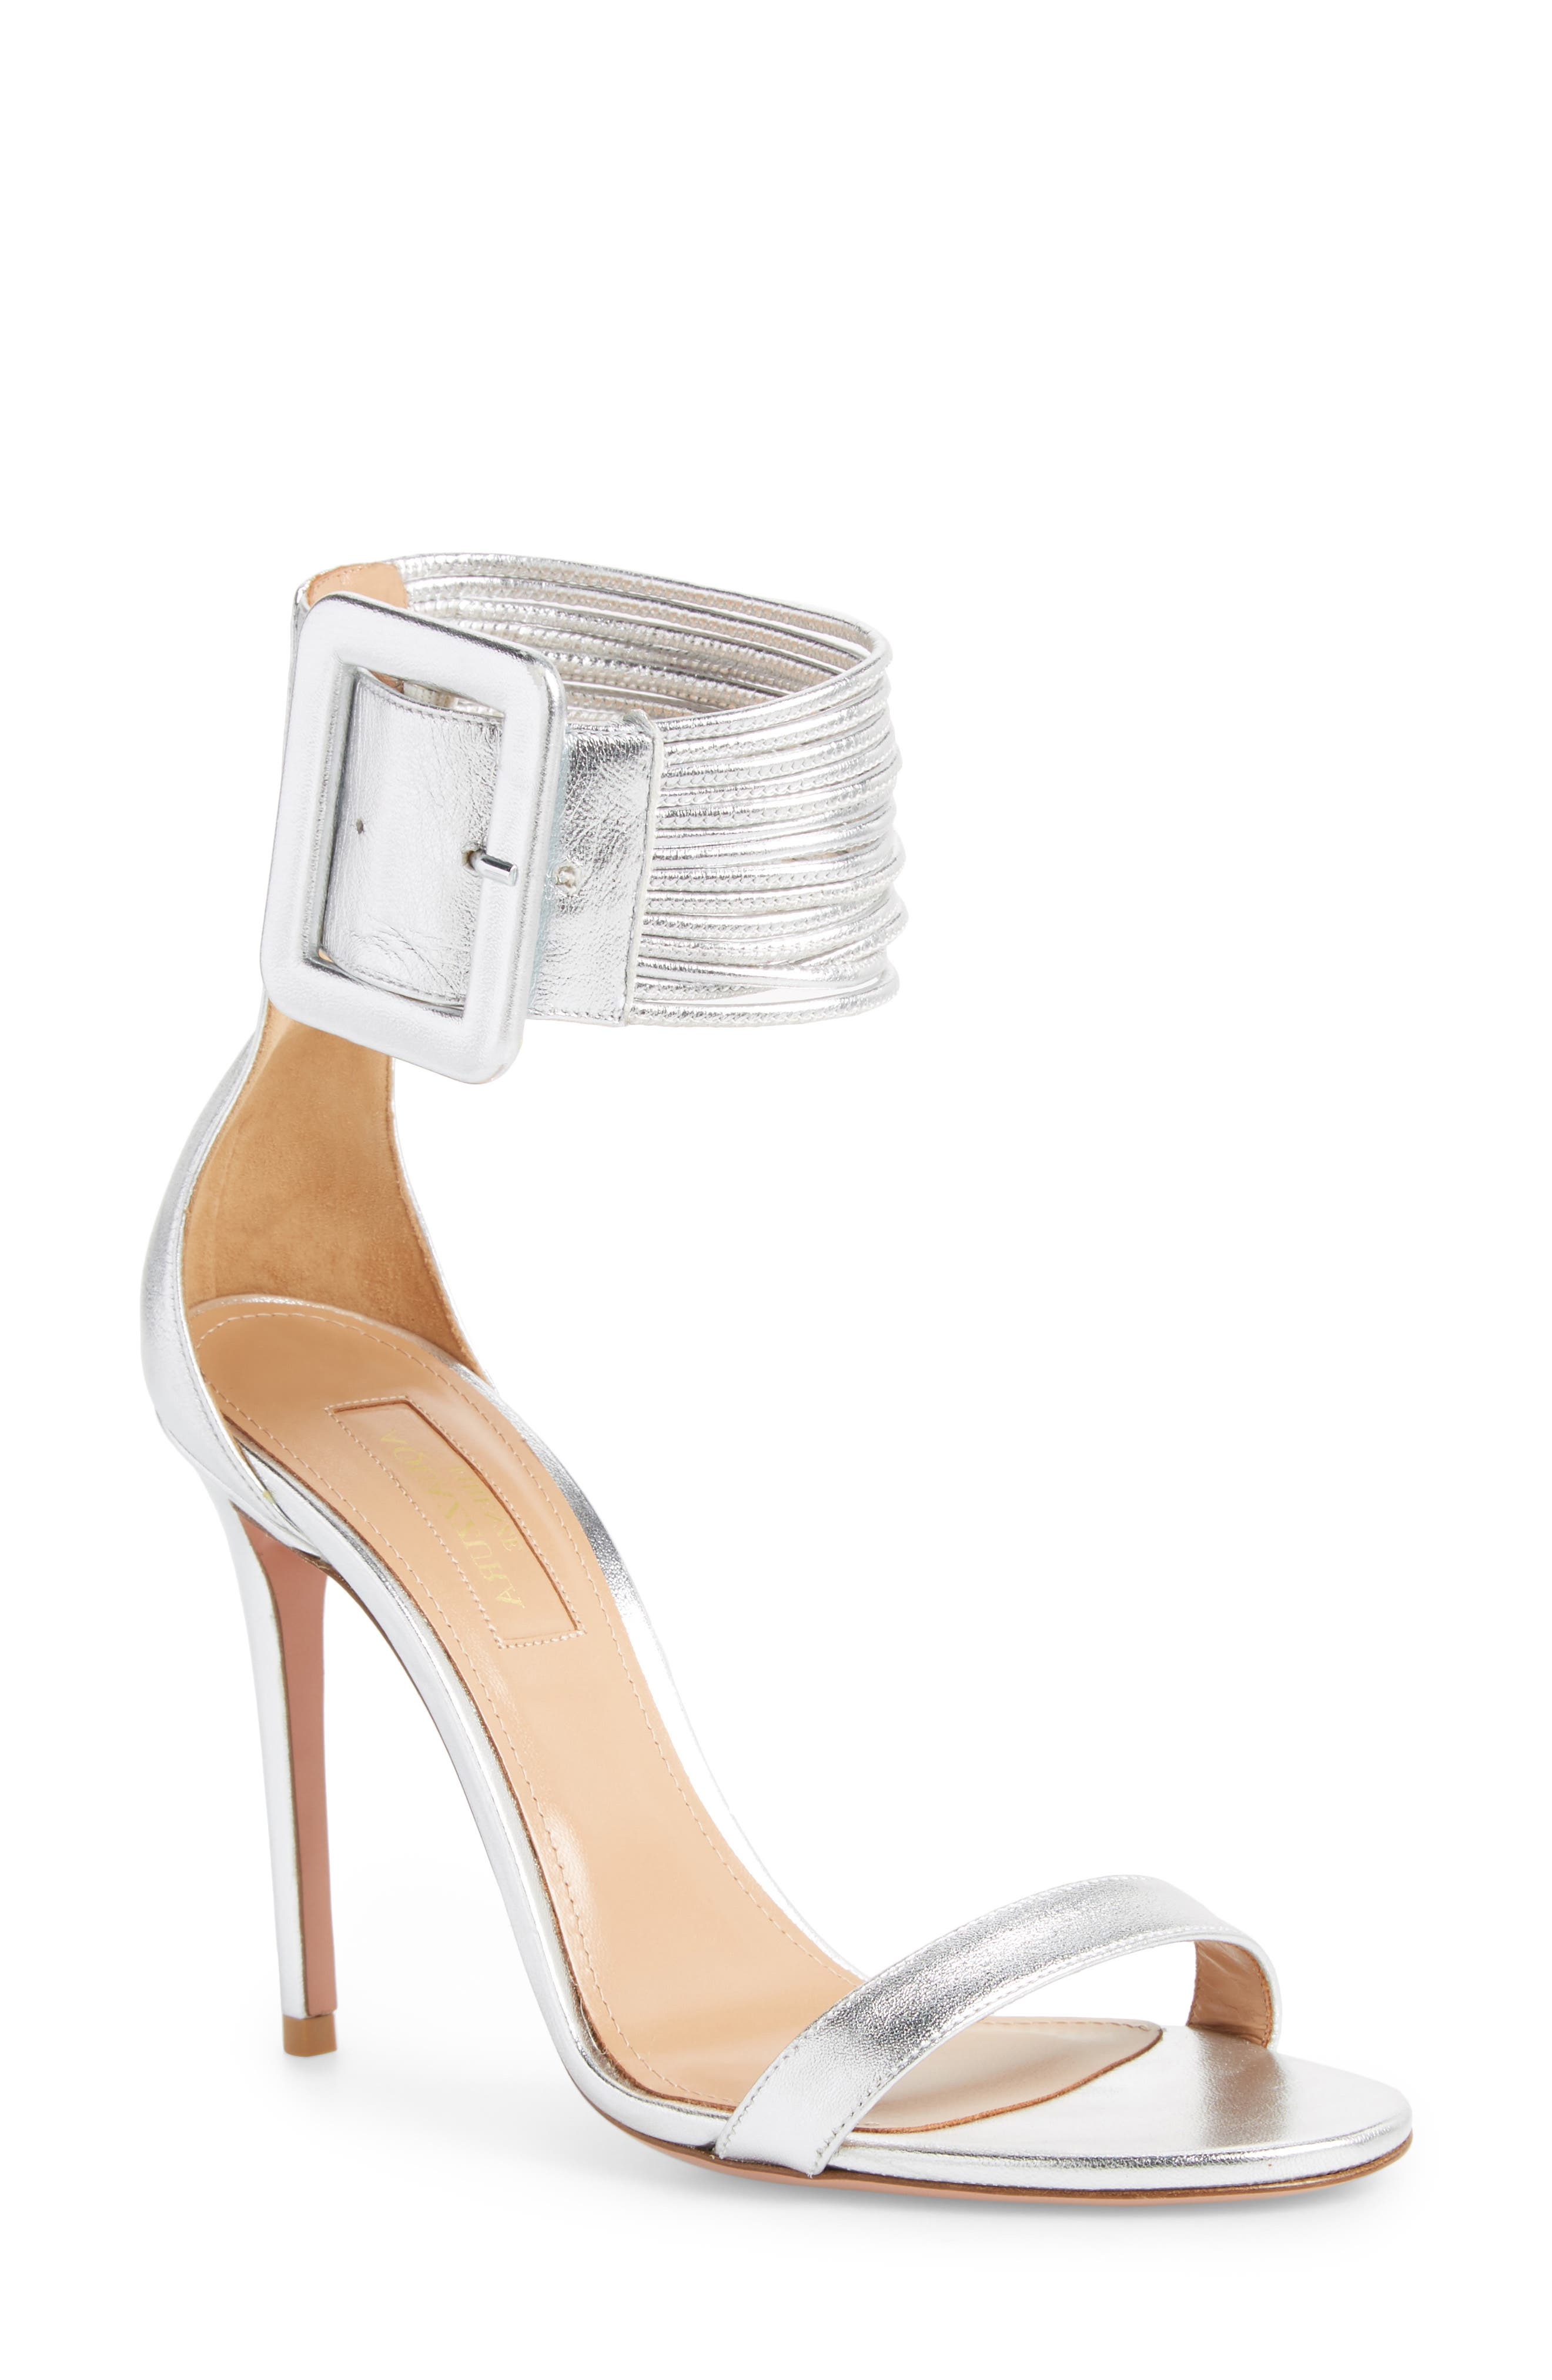 Alternate Image 1 Selected - Aquazzura Casablanca Ankle Cuff Sandal (Women)